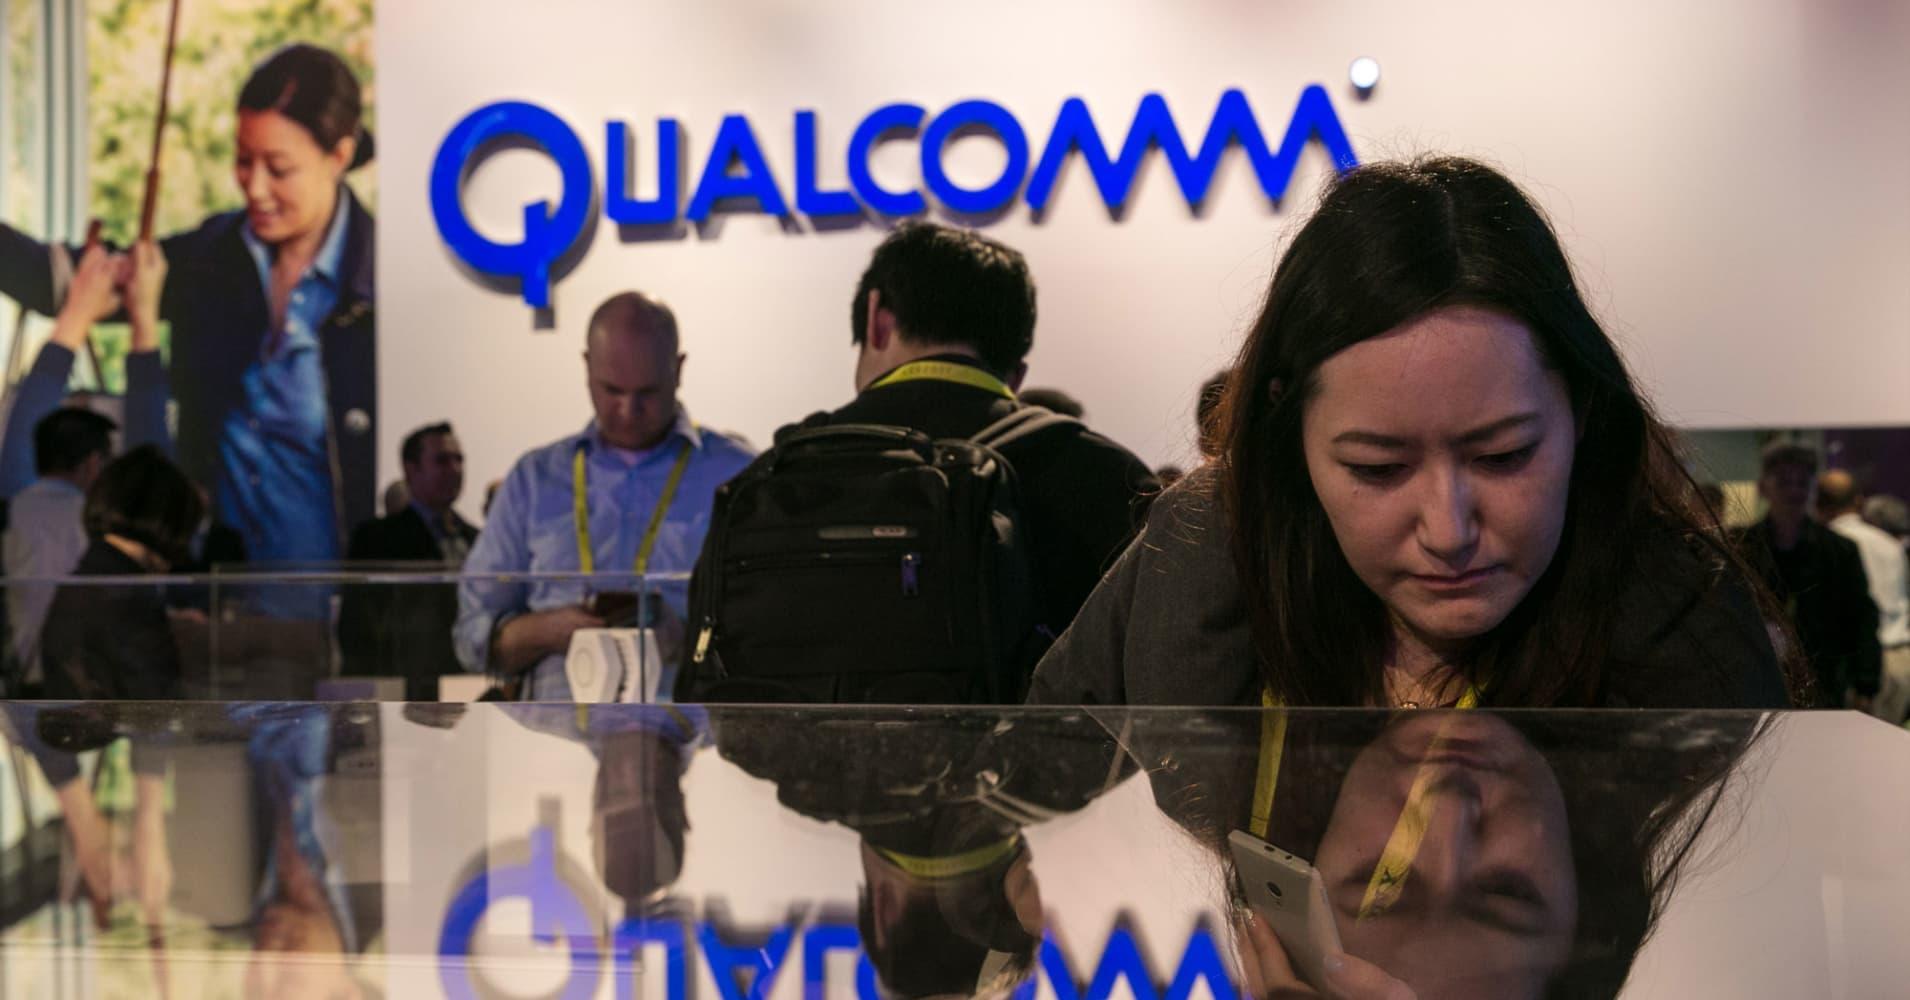 Qualcomm launches patent challenge to Apple ahead of antitrust case